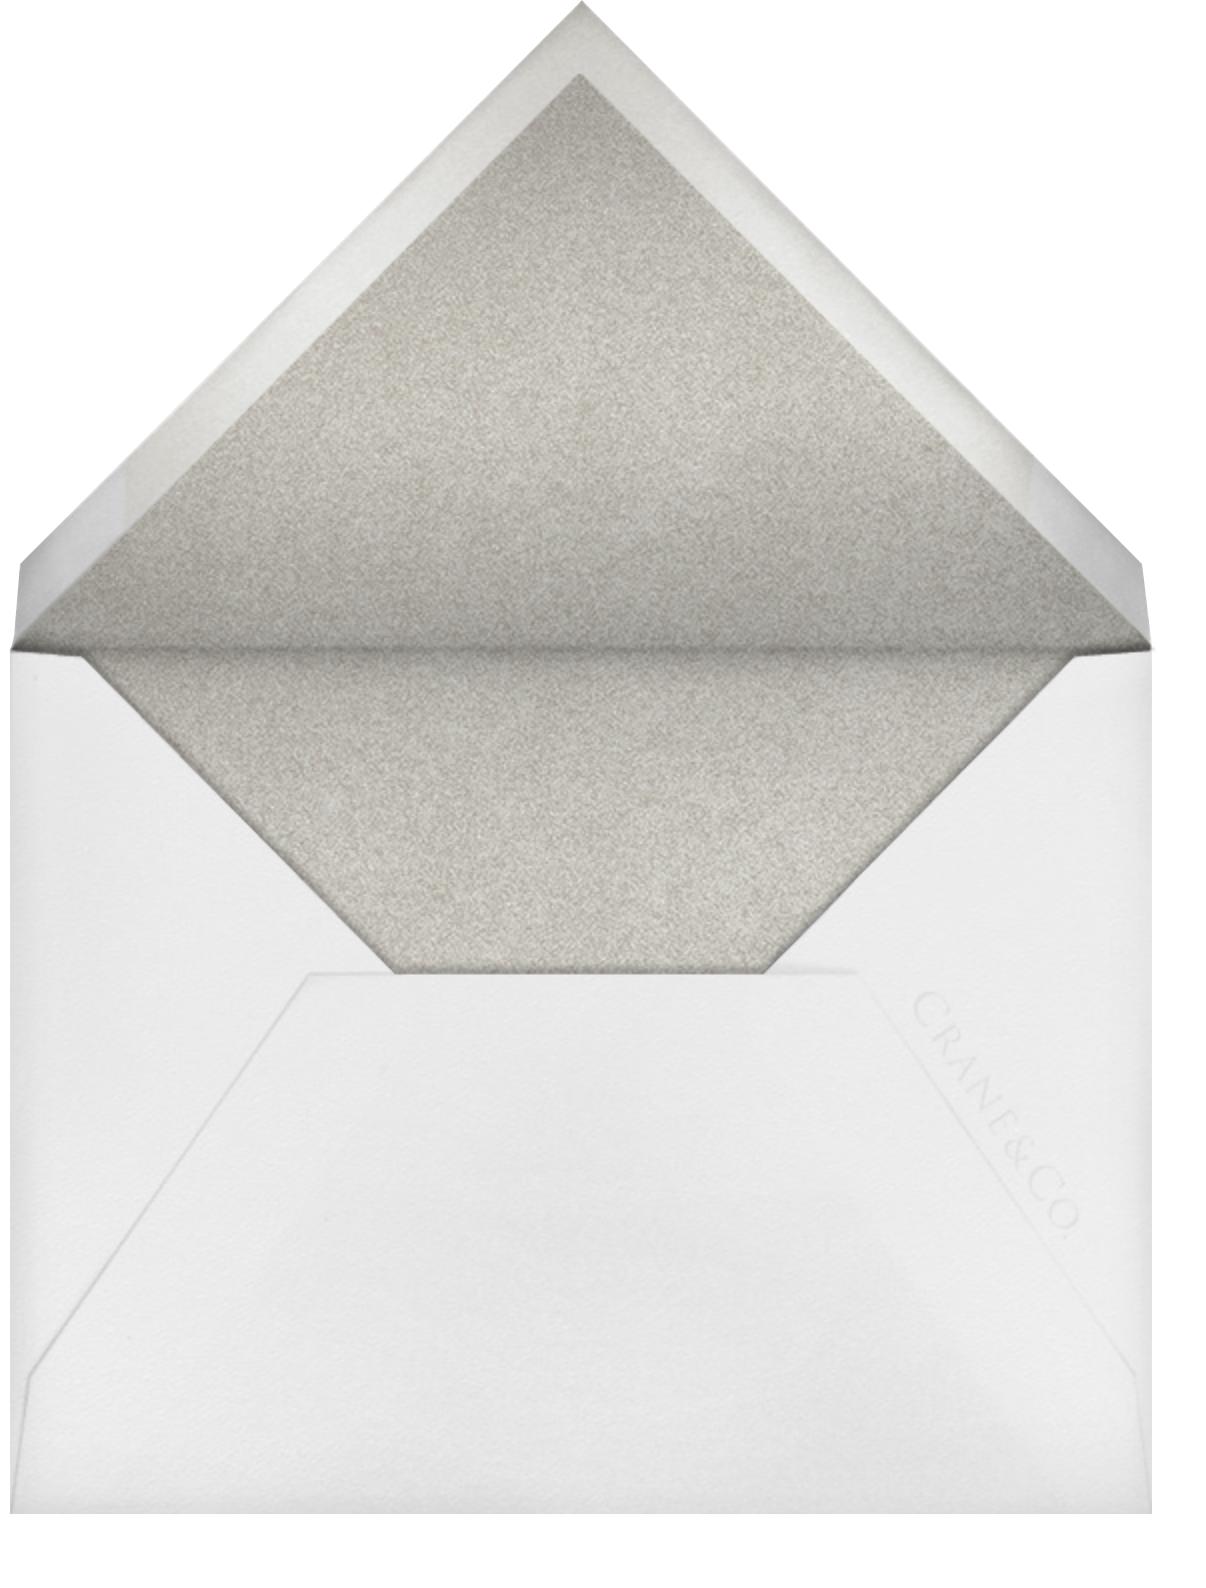 Bauhaus (Thank You) - Regent Blue and Platinum - Crane & Co. - Envelope